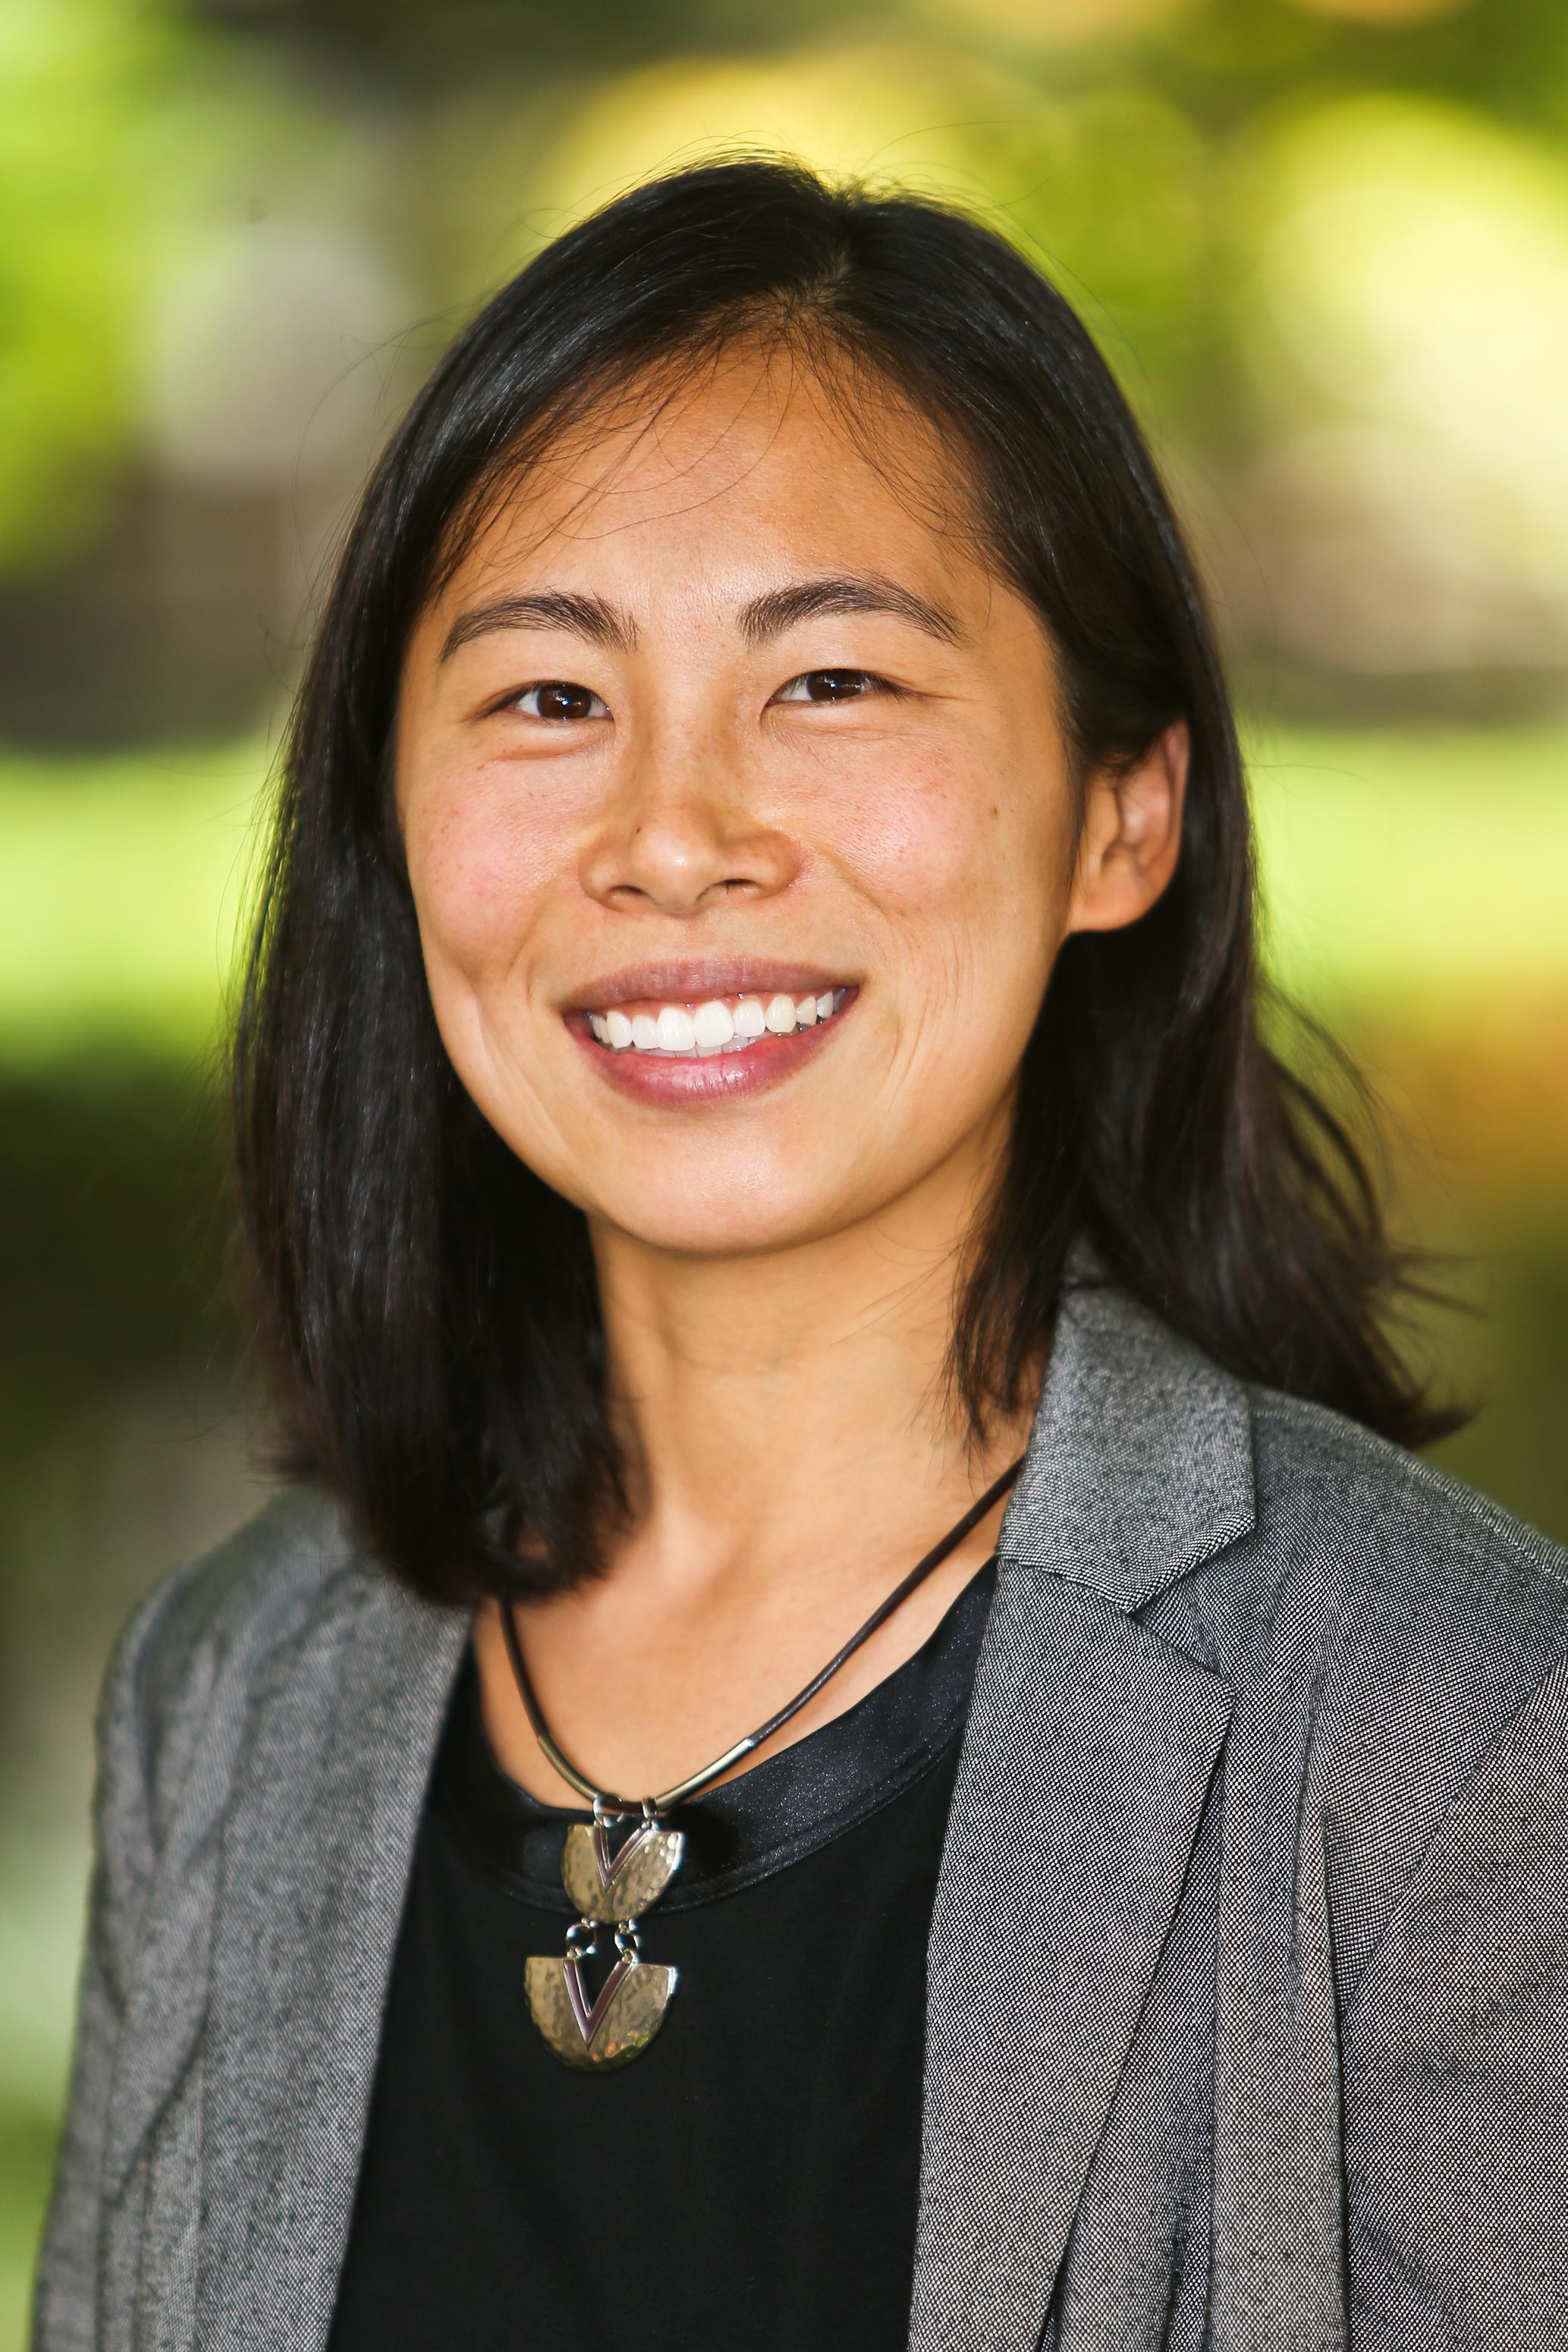 Christina Kwauk